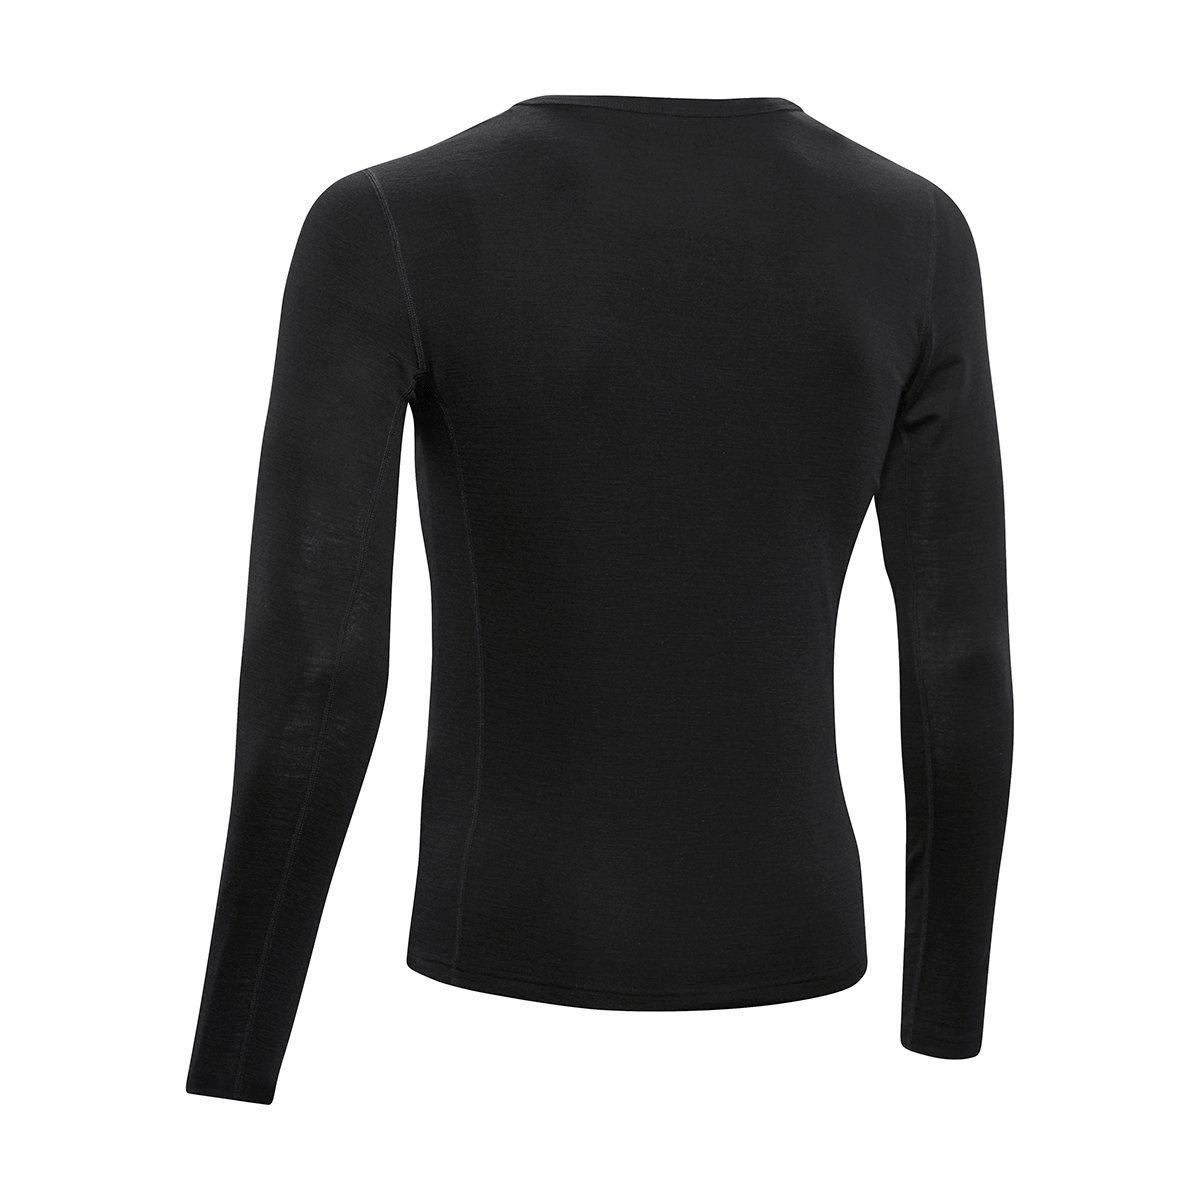 Cycling Clothing Supply Long Shirt Women Merino Black Size S 34-36 F-lite Bicycle Cheap Sales 50%